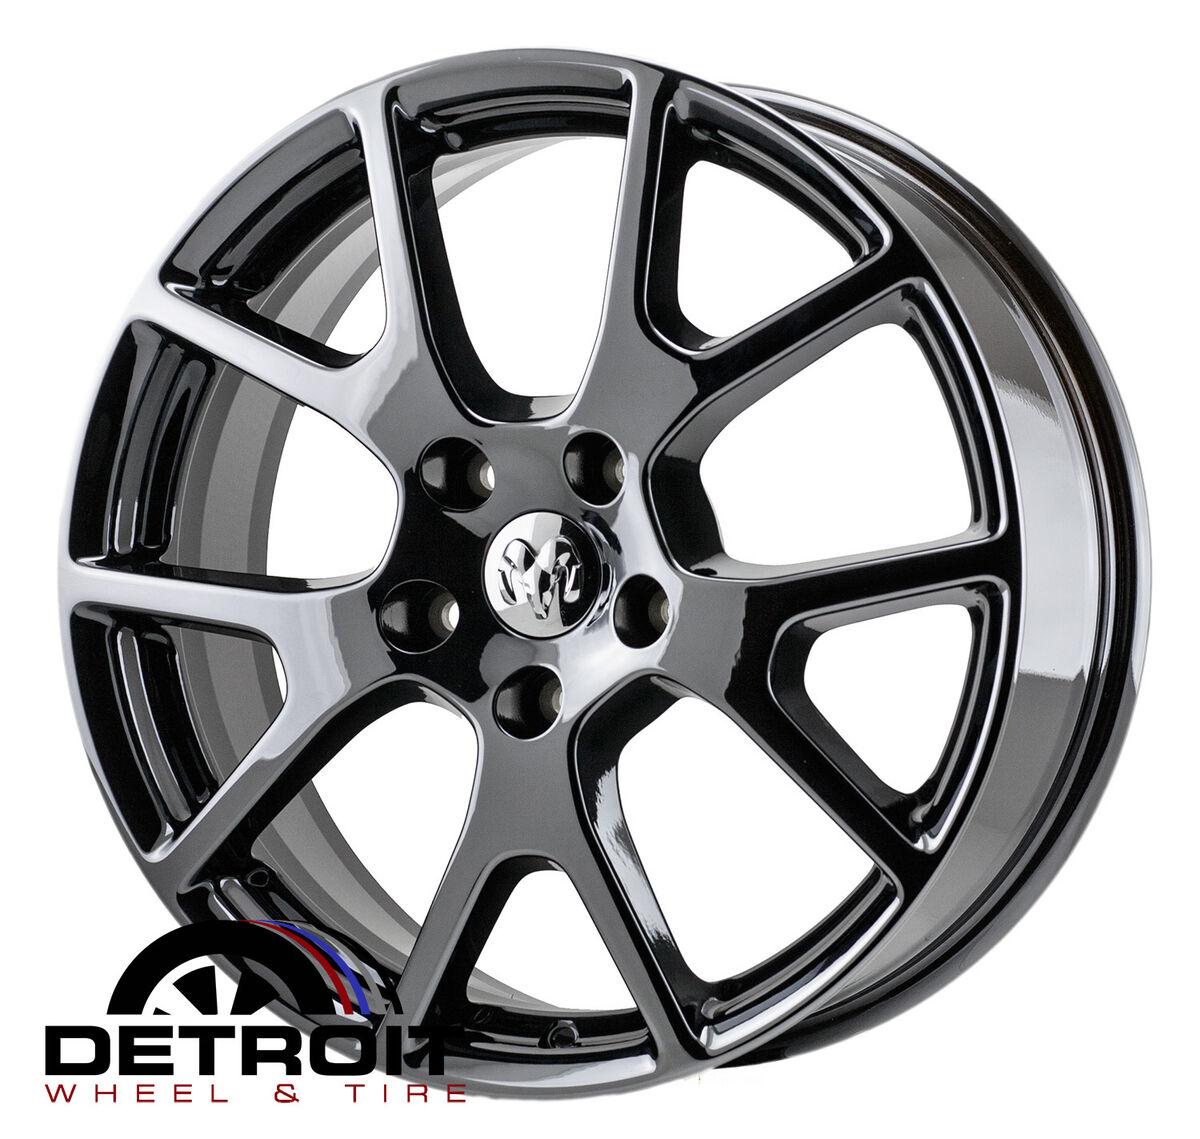 Dodge Journey PVD Black Chrome Wheels Factory Rim 2422 Exchange 2011 2014